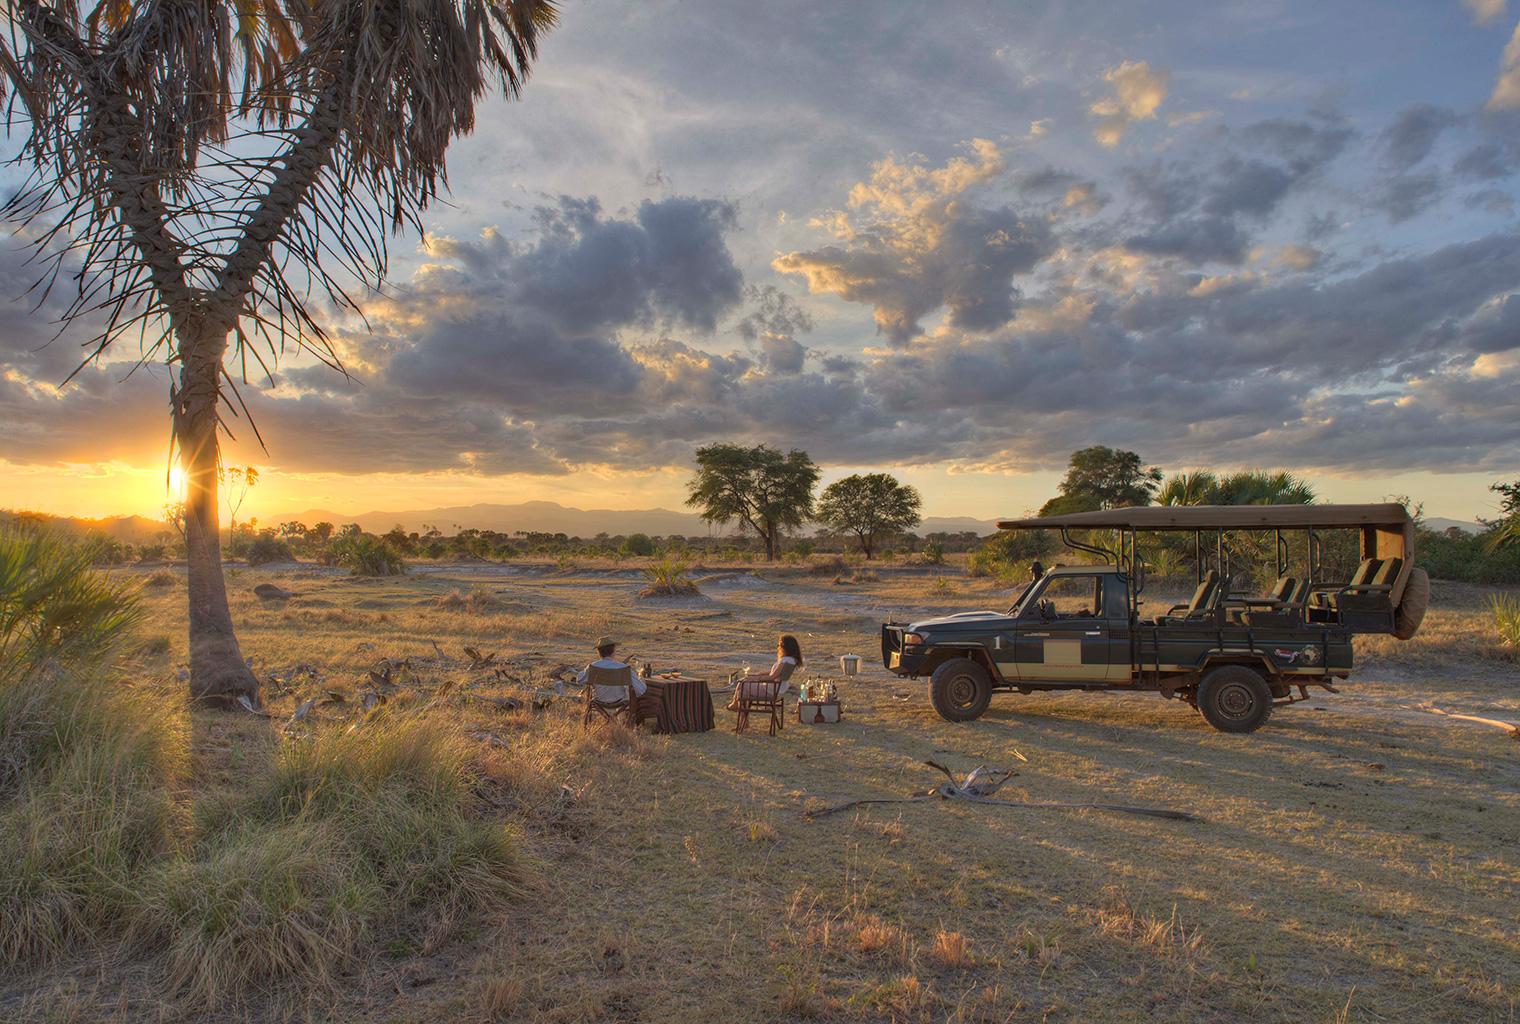 Elsa's-Kopje-Camp-Kenya-Sundowner